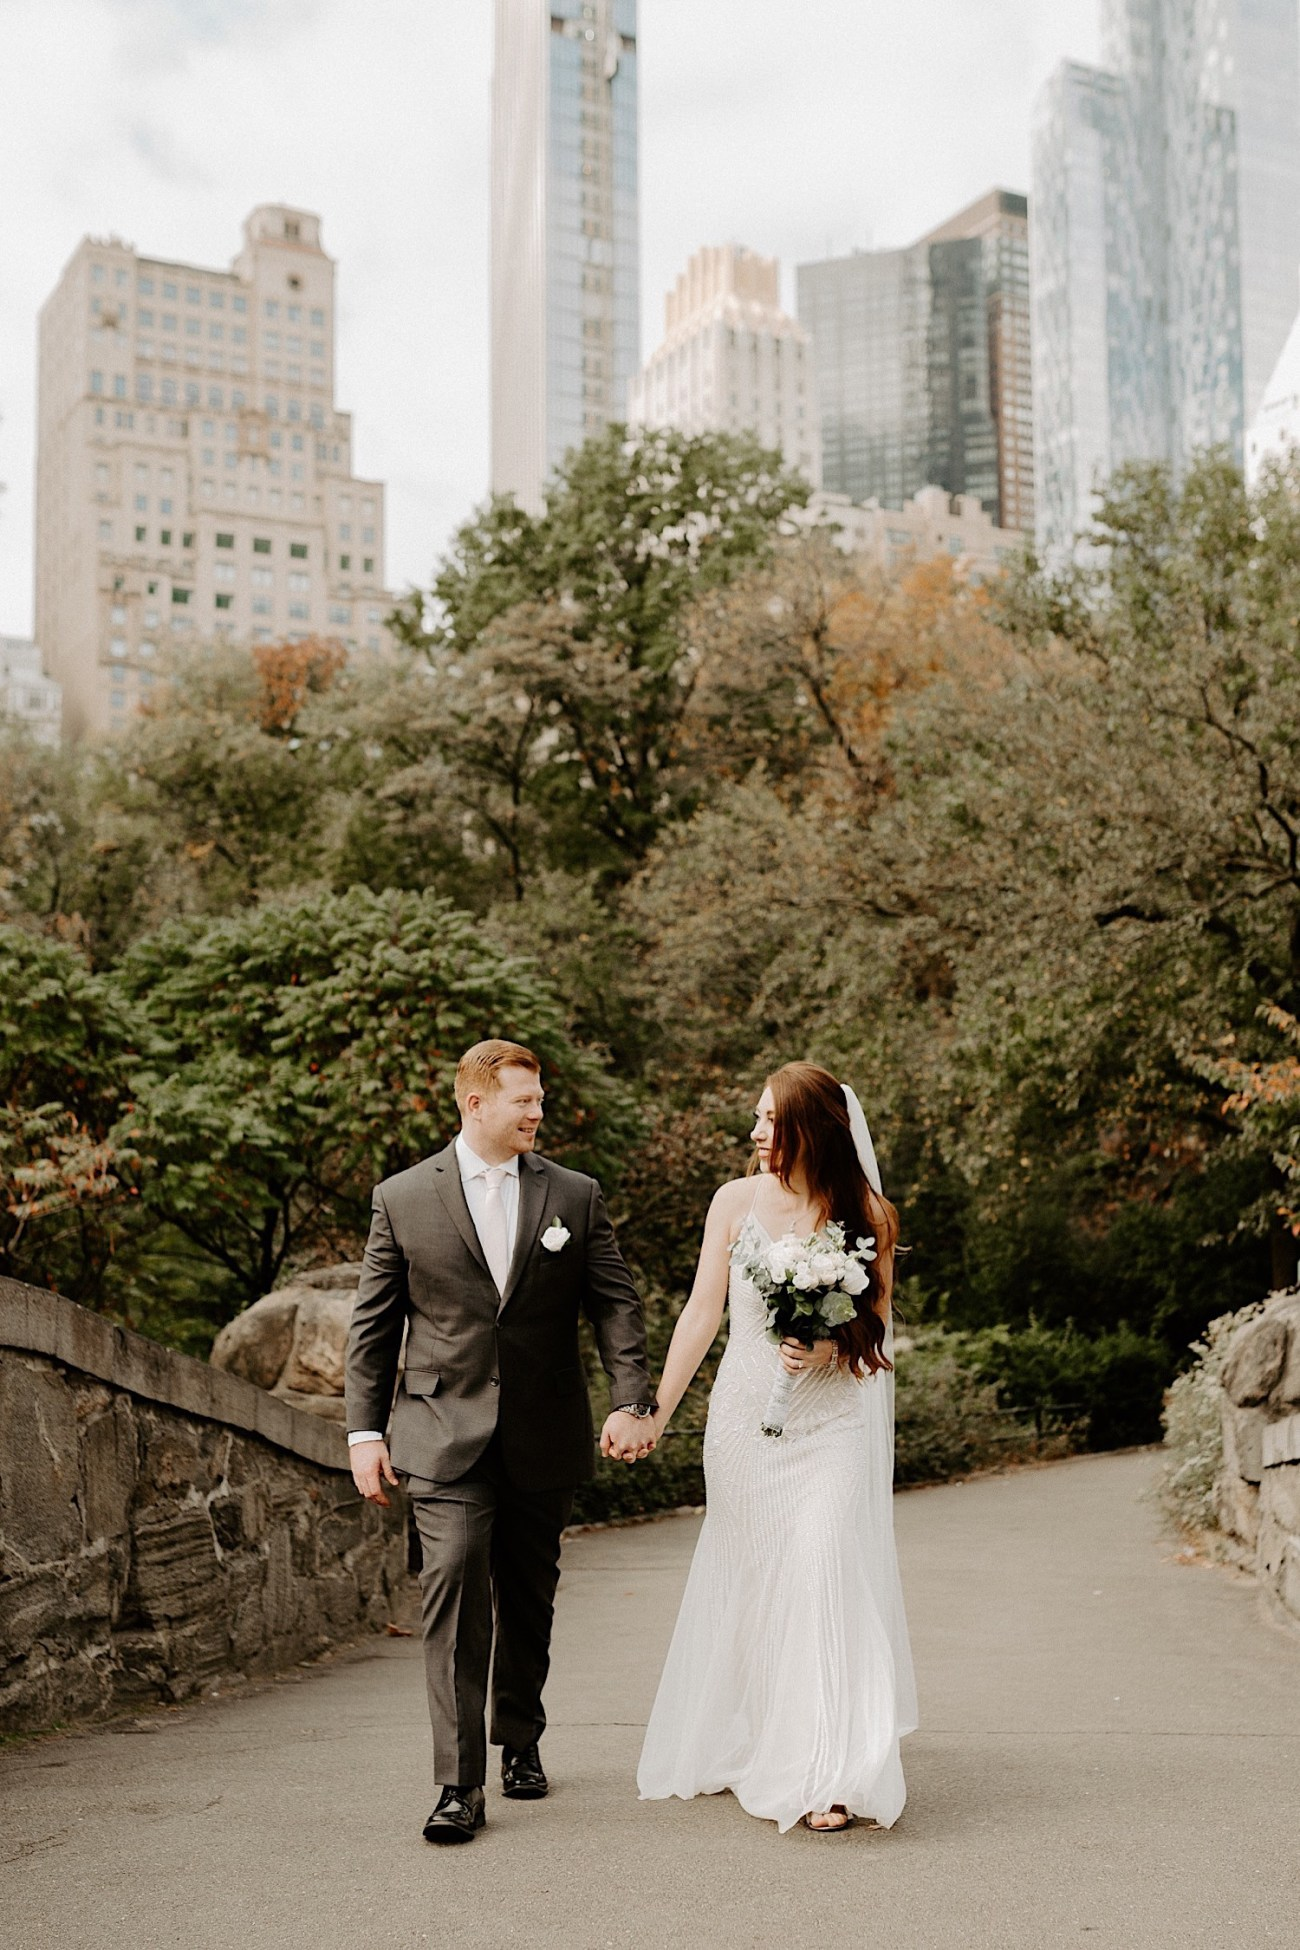 Central Park Wedding Photos Central Park Elopement NYC Wedding Photographer 04